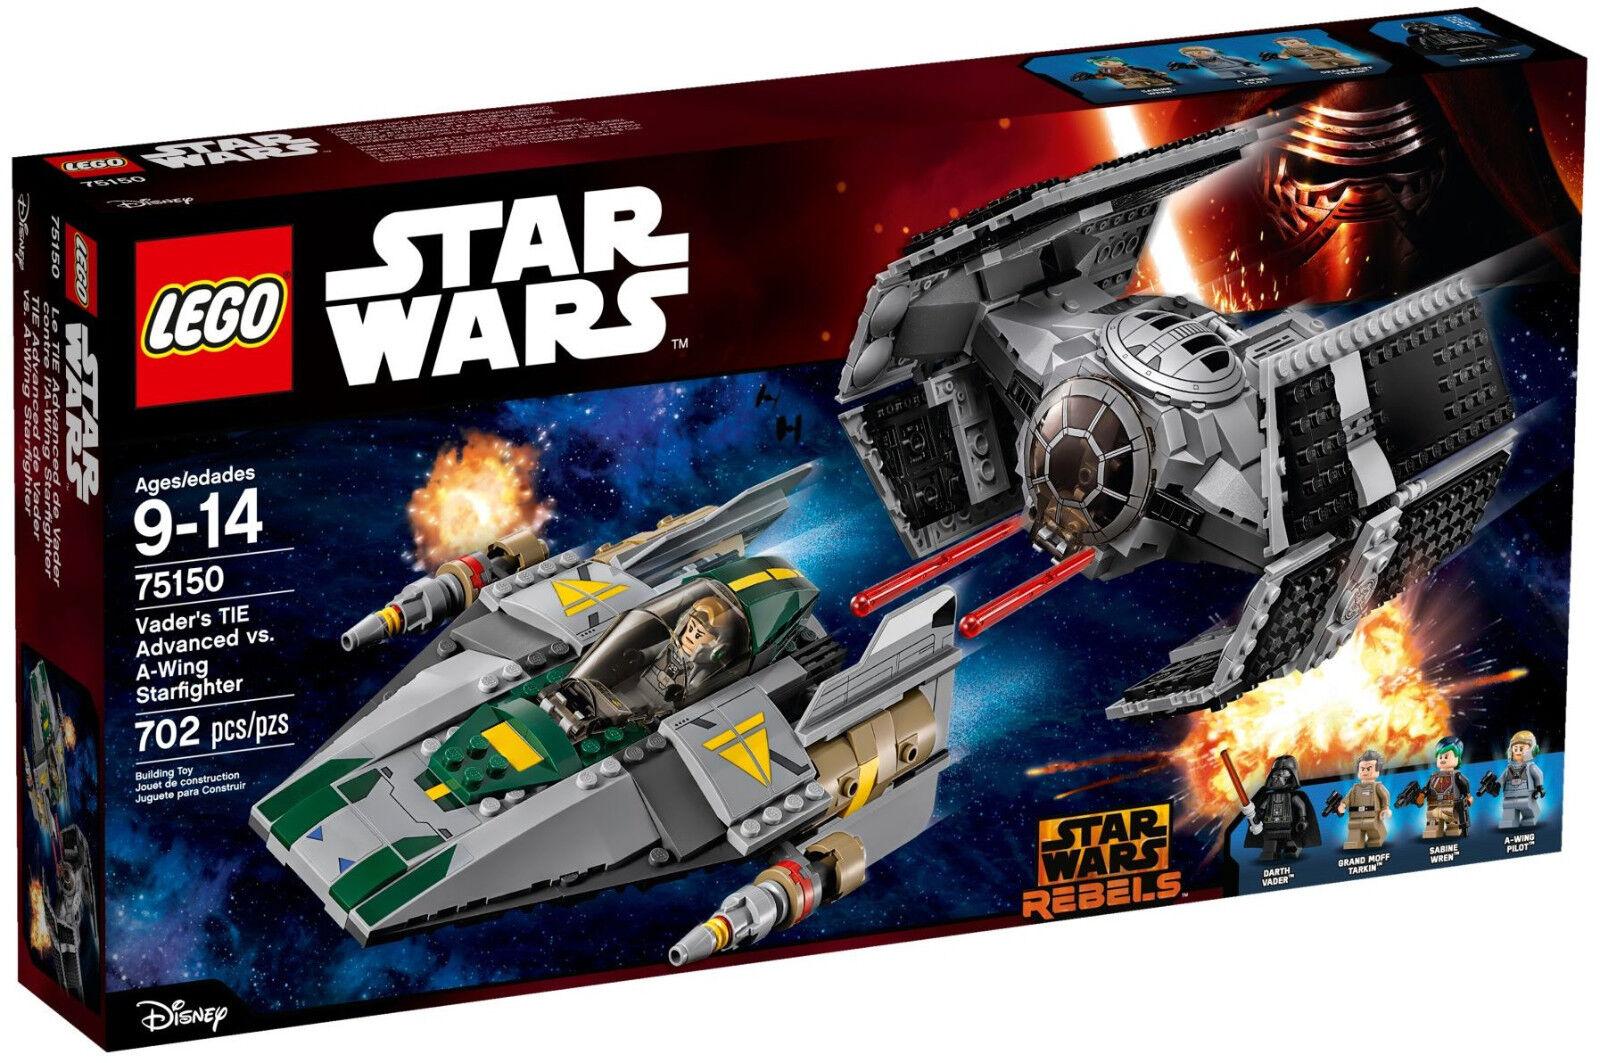 Lego Star Wars - 75150 Vader's tie Advanced vs. a-Wing Starfighter-nuevo & OVP